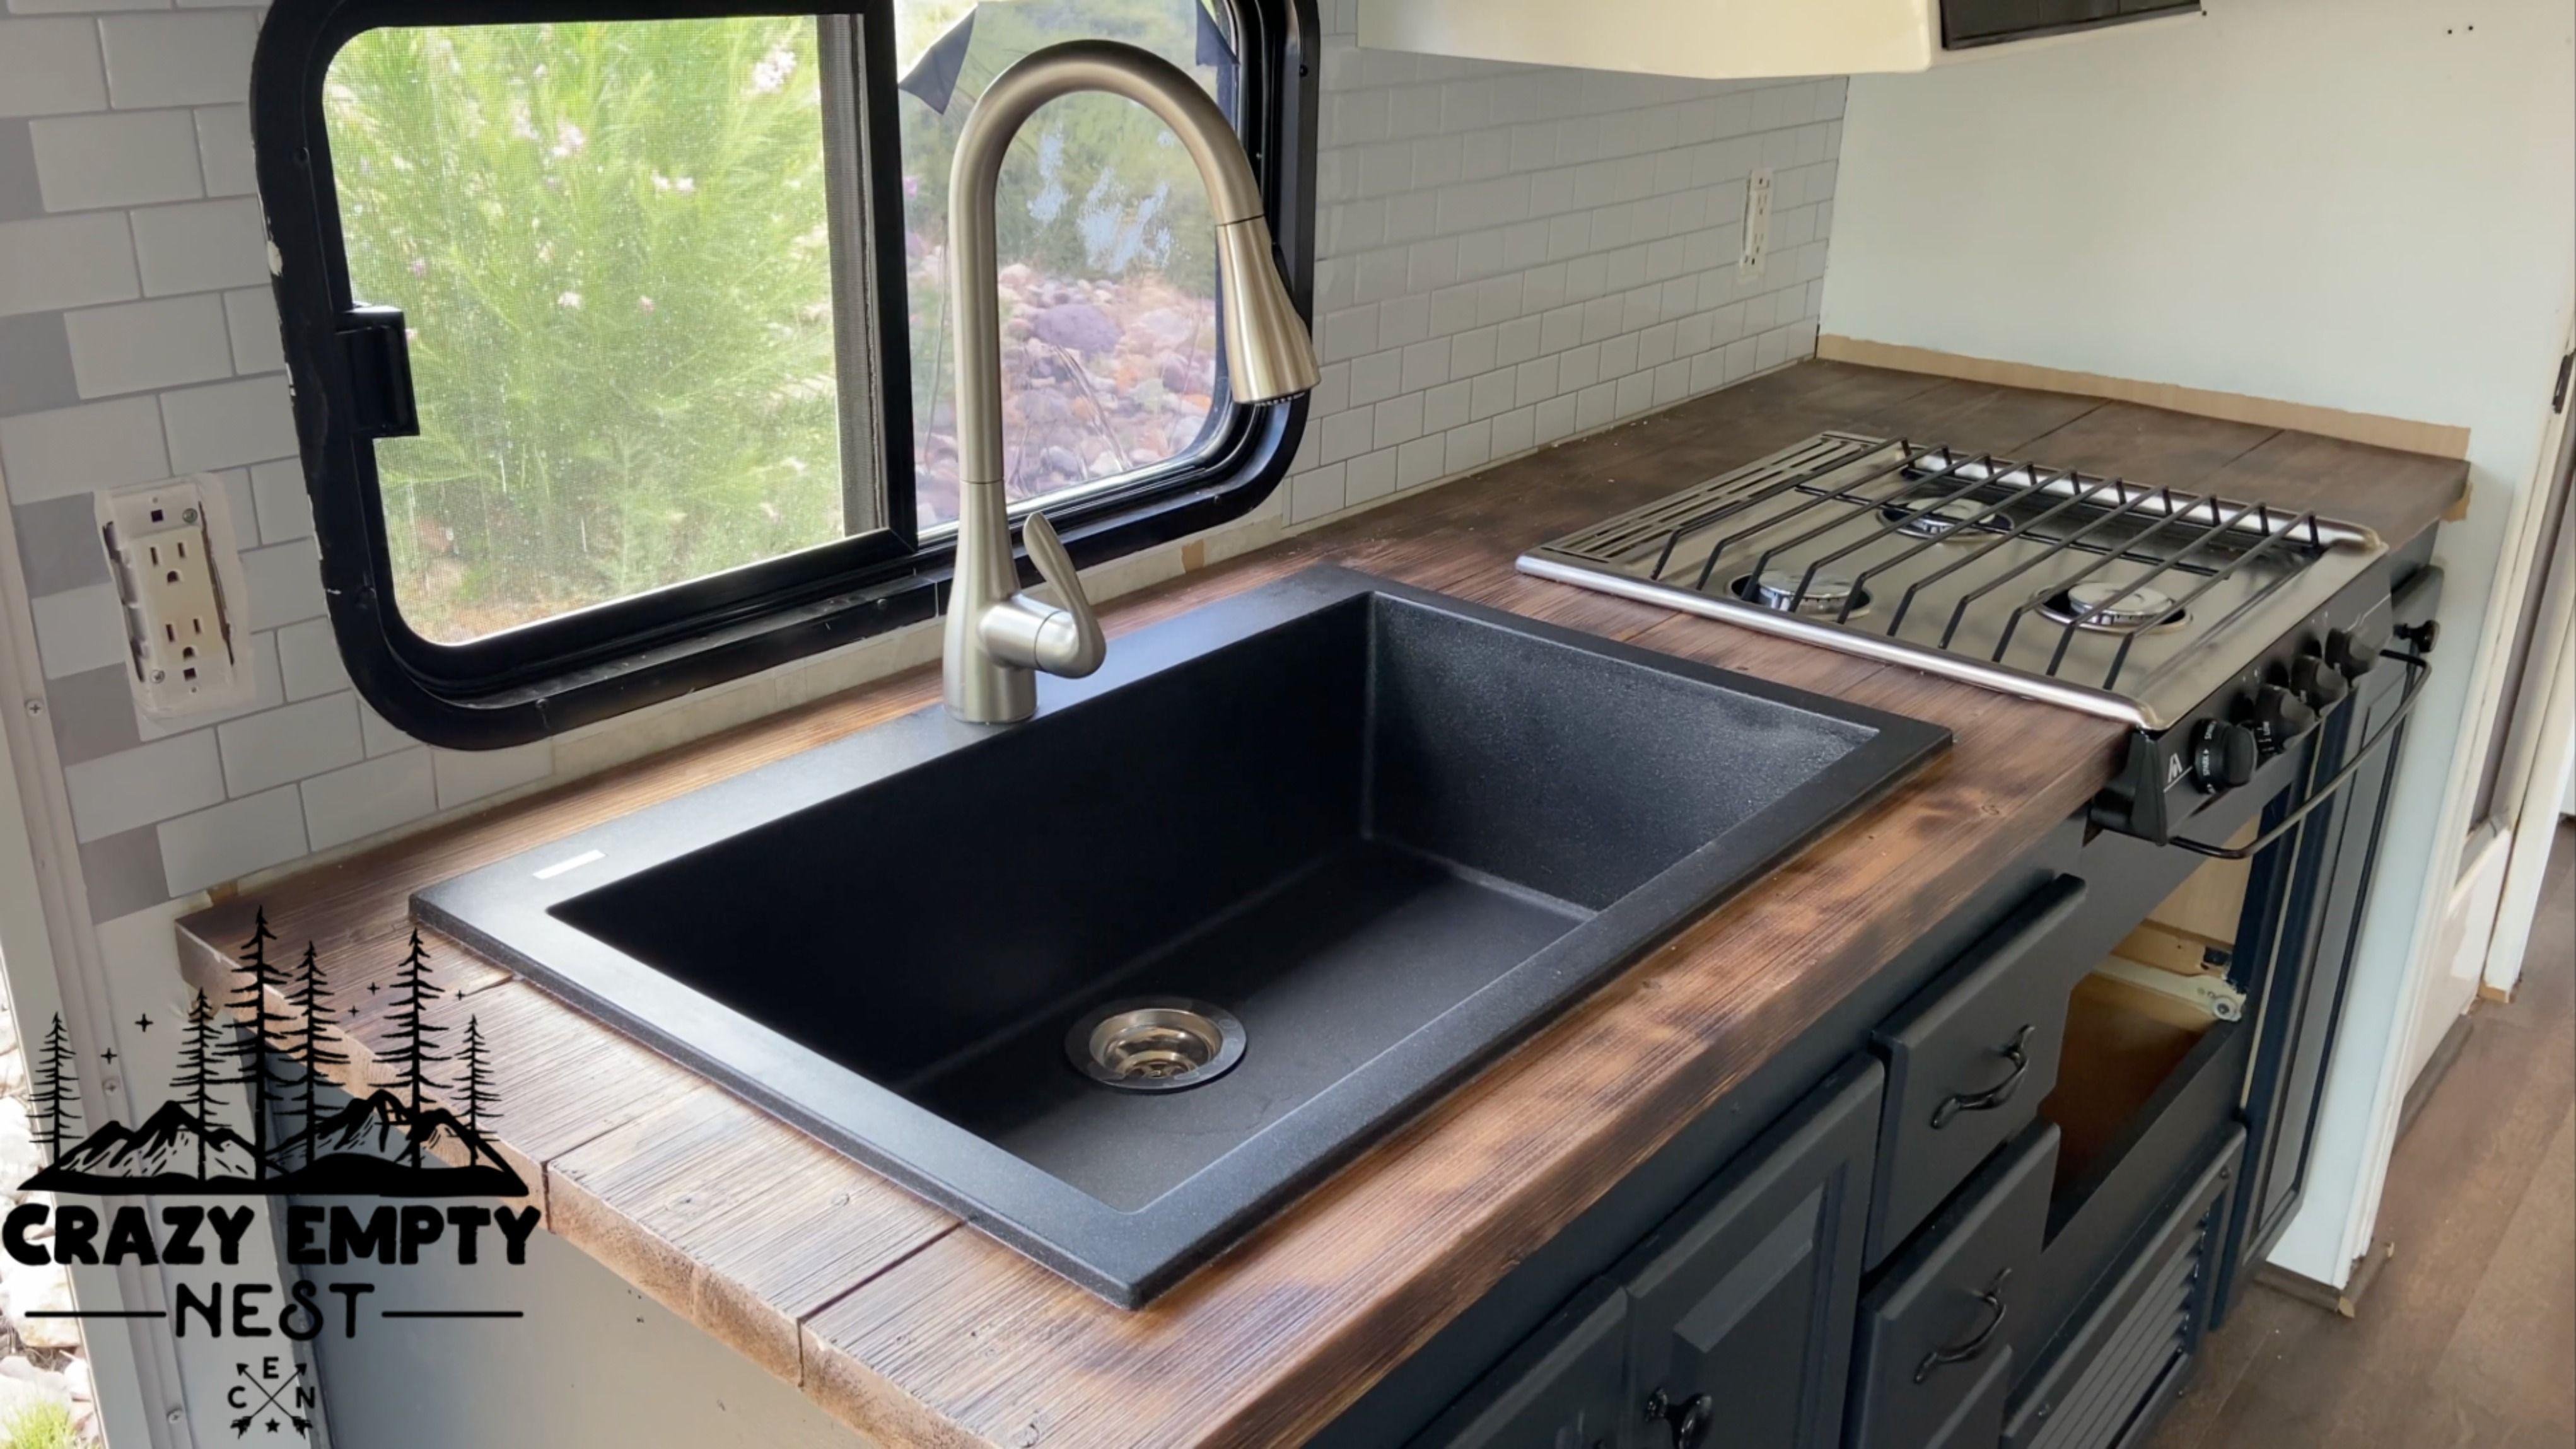 Vintage Rv Reno Sink Kitchen Sink Remodel Diy Camper Remodel Rv Sink